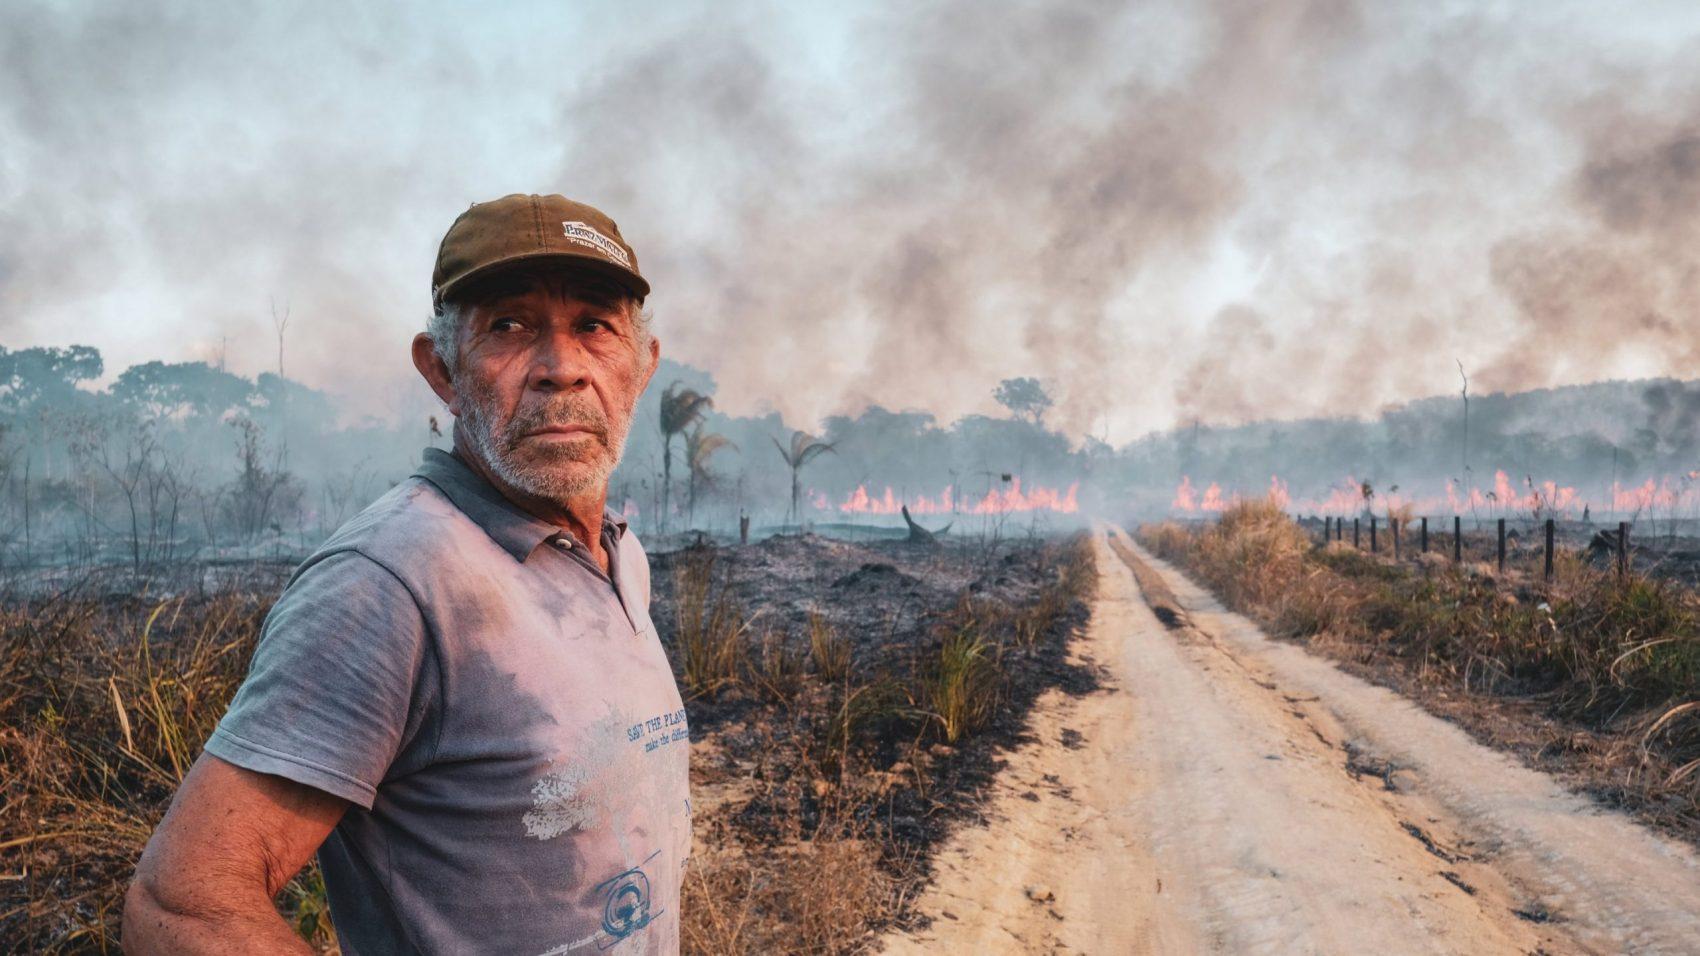 Outbreaks, Fires, Amazon, Human